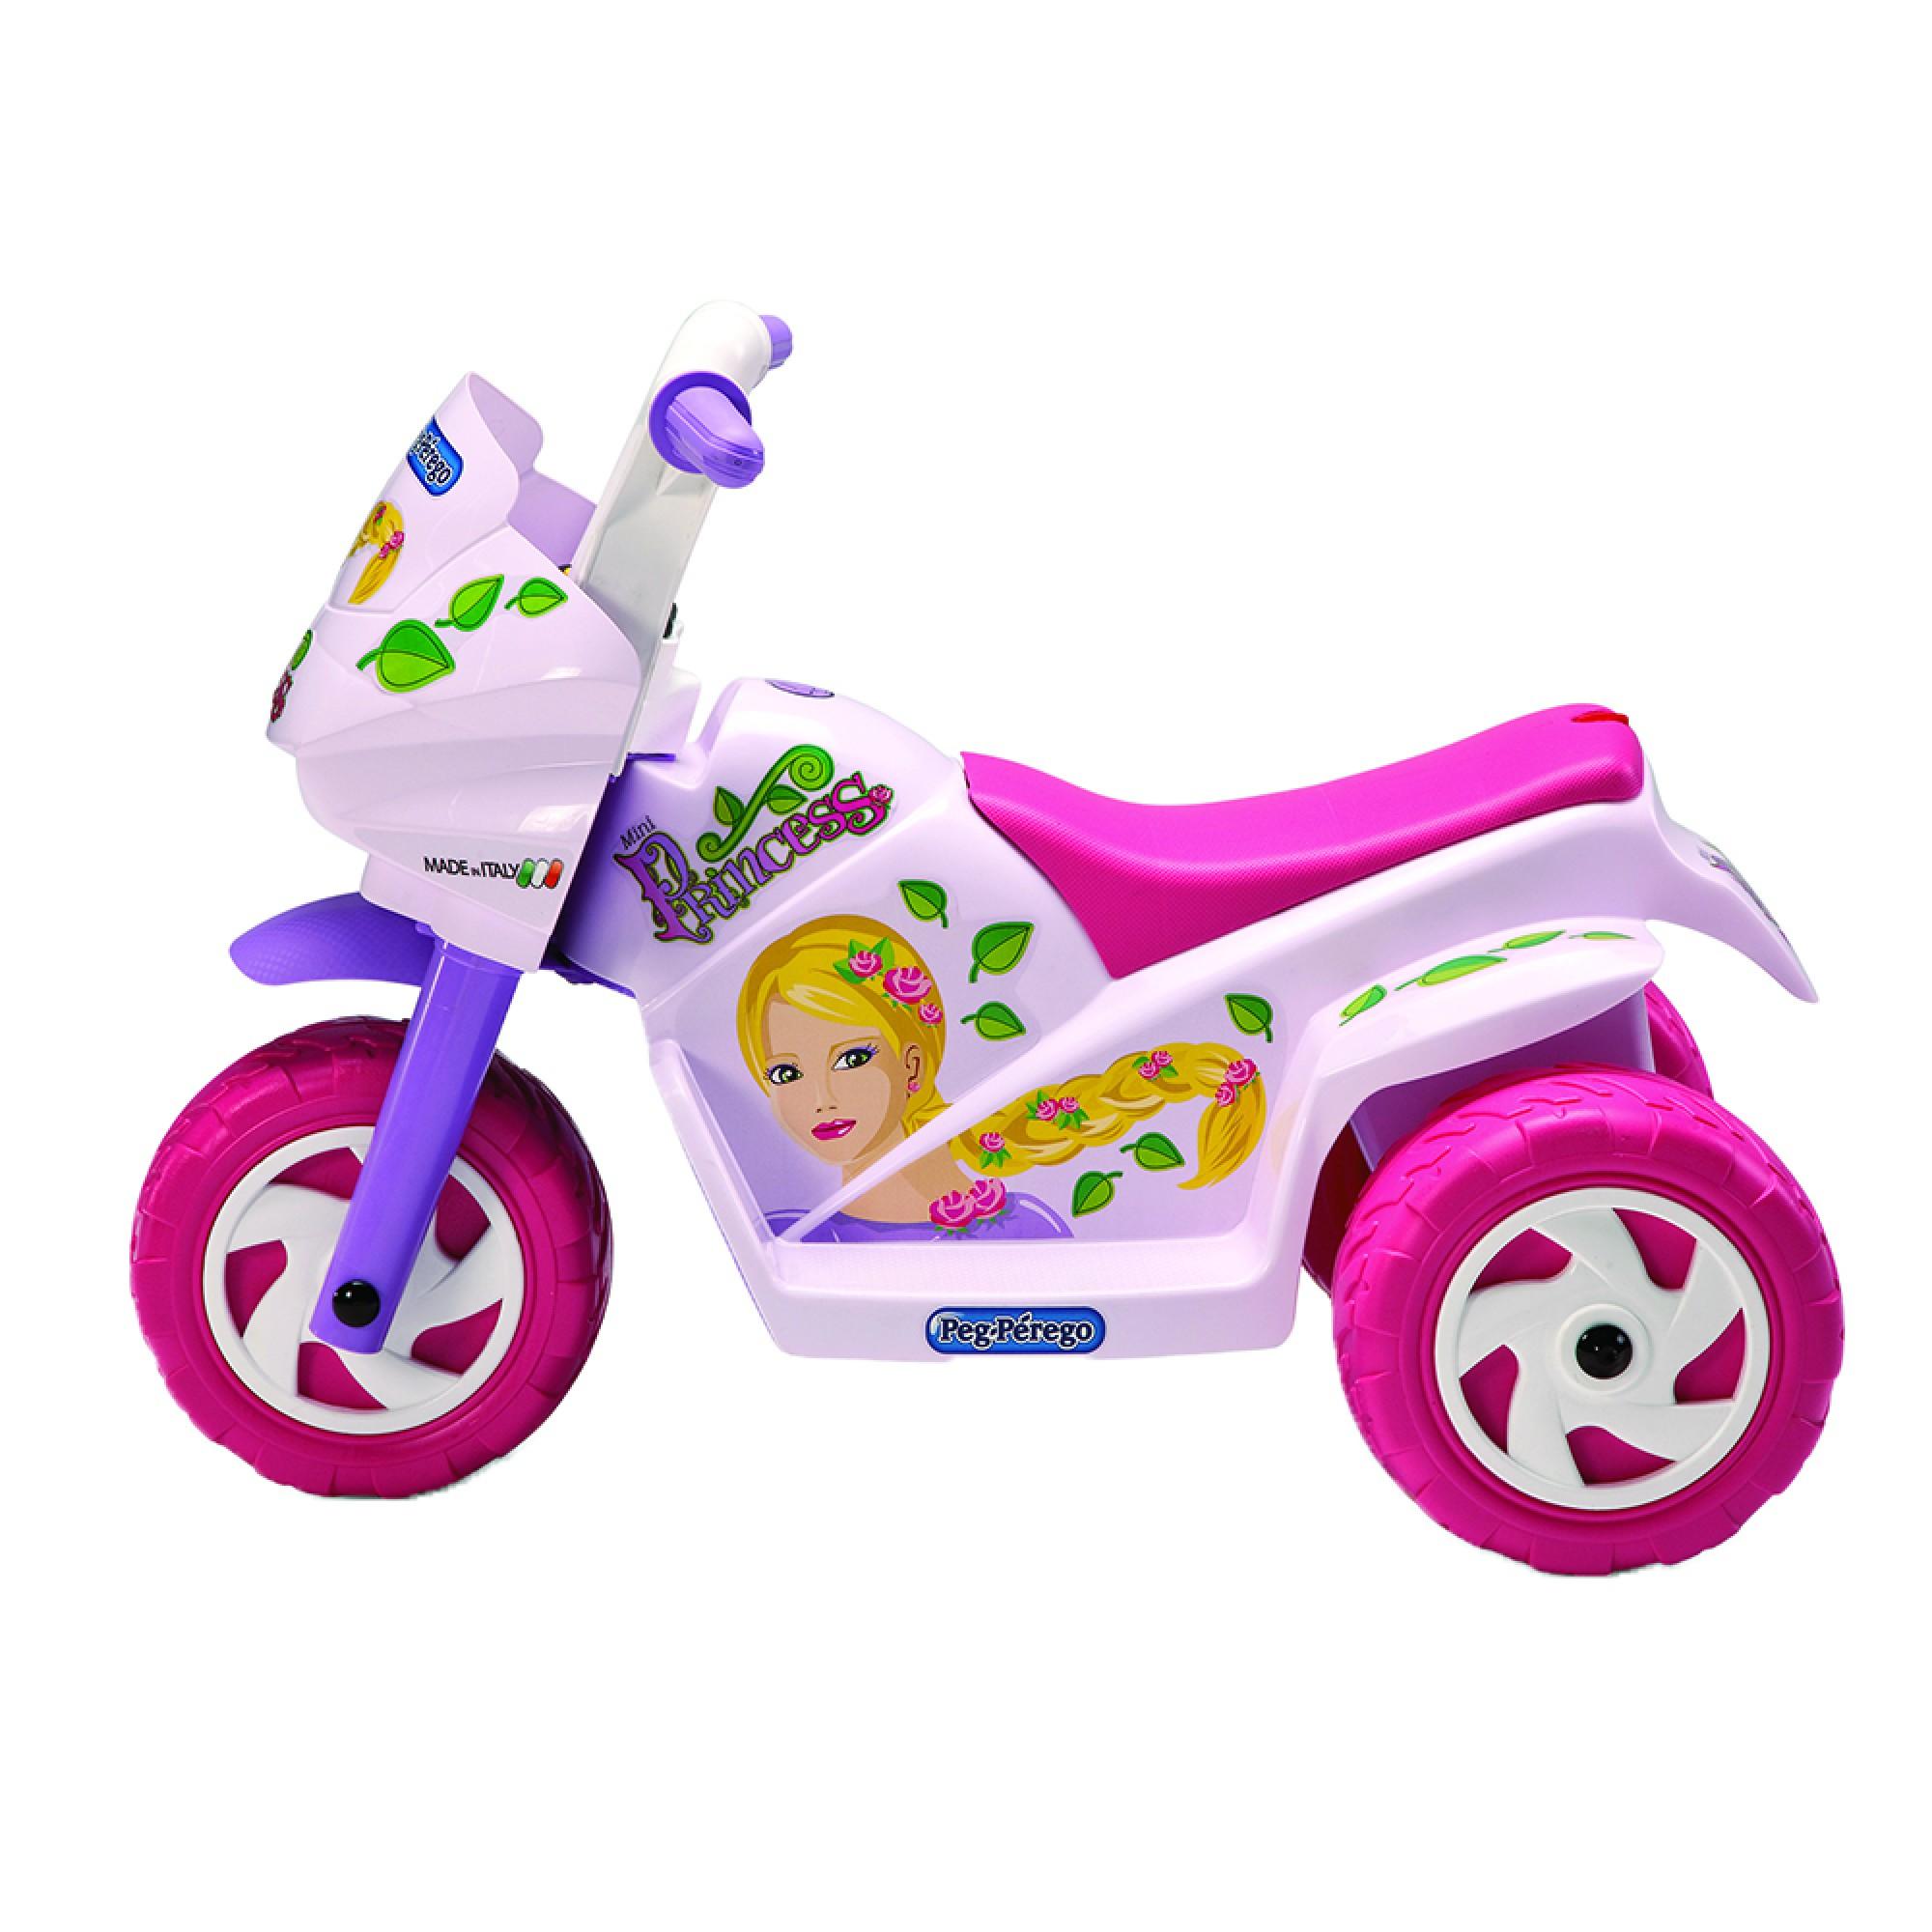 Tricicleta, Mini Princess, Peg Perego